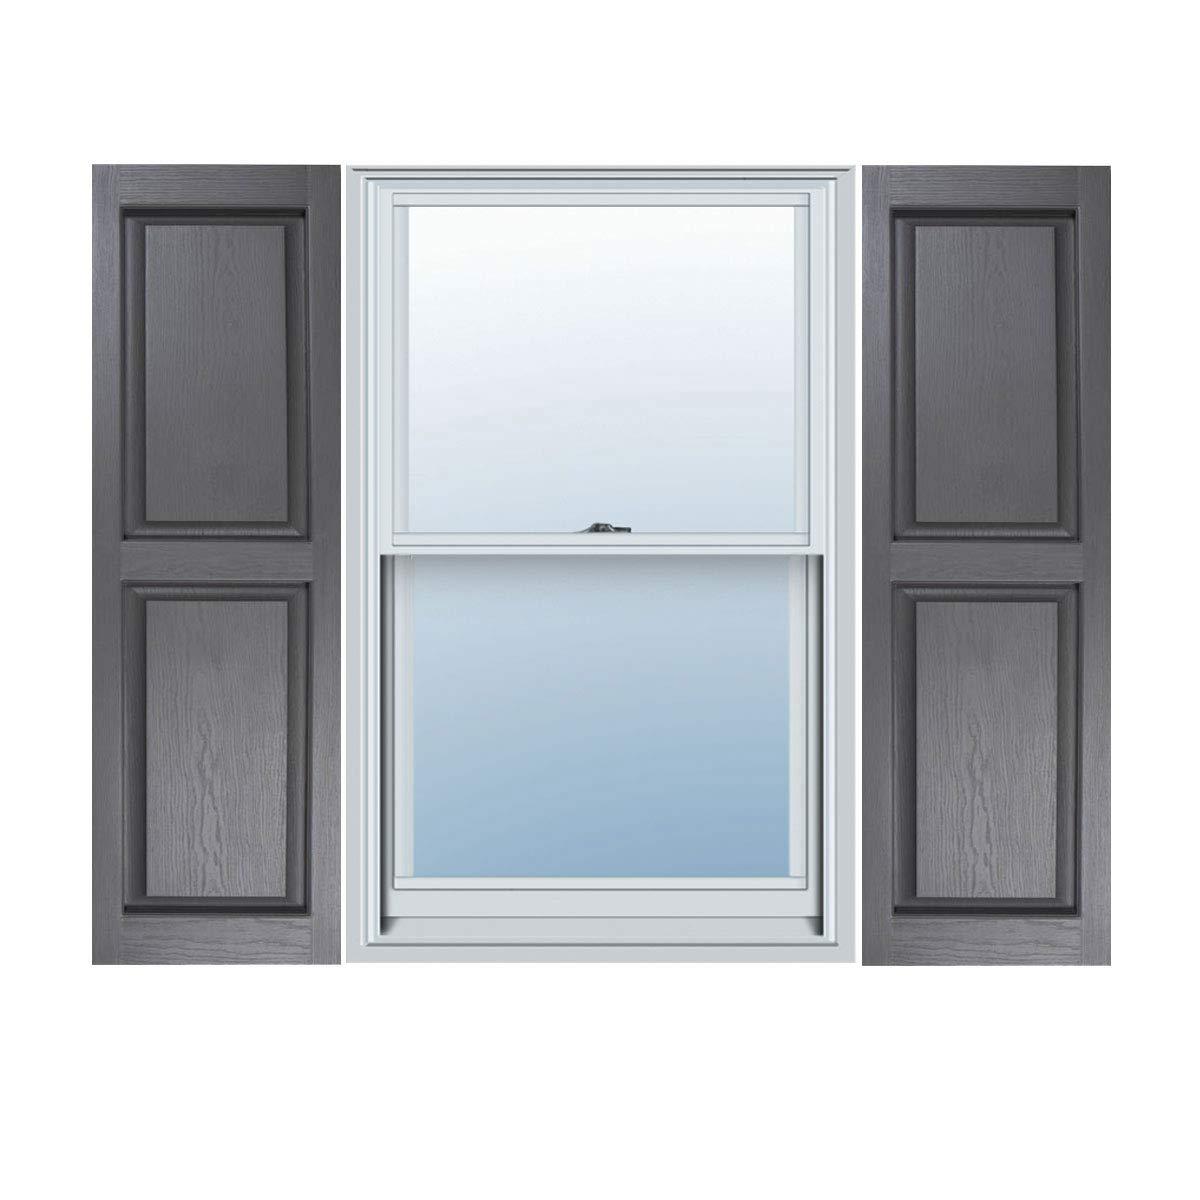 14 1/2'' x 70'' Builders Choice Vinyl Raised Panel Window Shutters, w/Shutter Spikes & Screws (Per Pair), Grey by ArchitecturalDepot.com